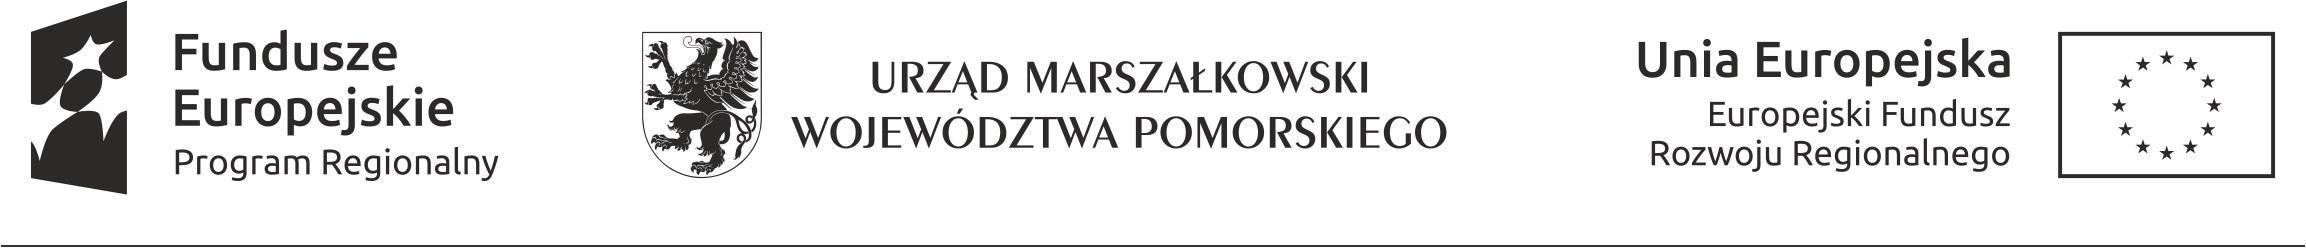 2020_07_22_ logo